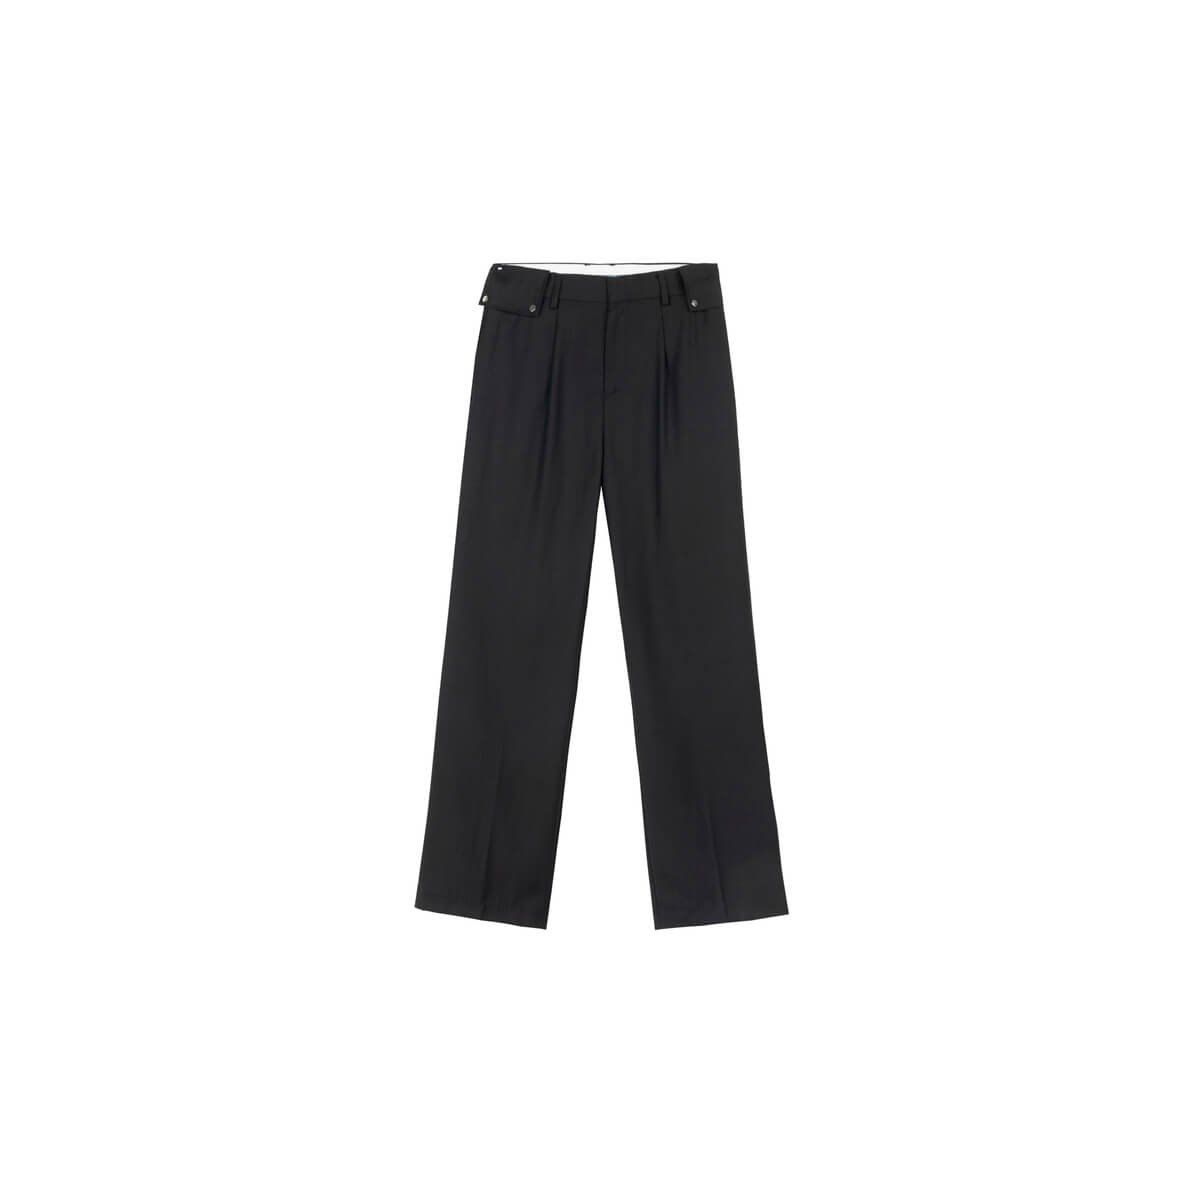 Брюки DL Studio Textured Draped Pants Black